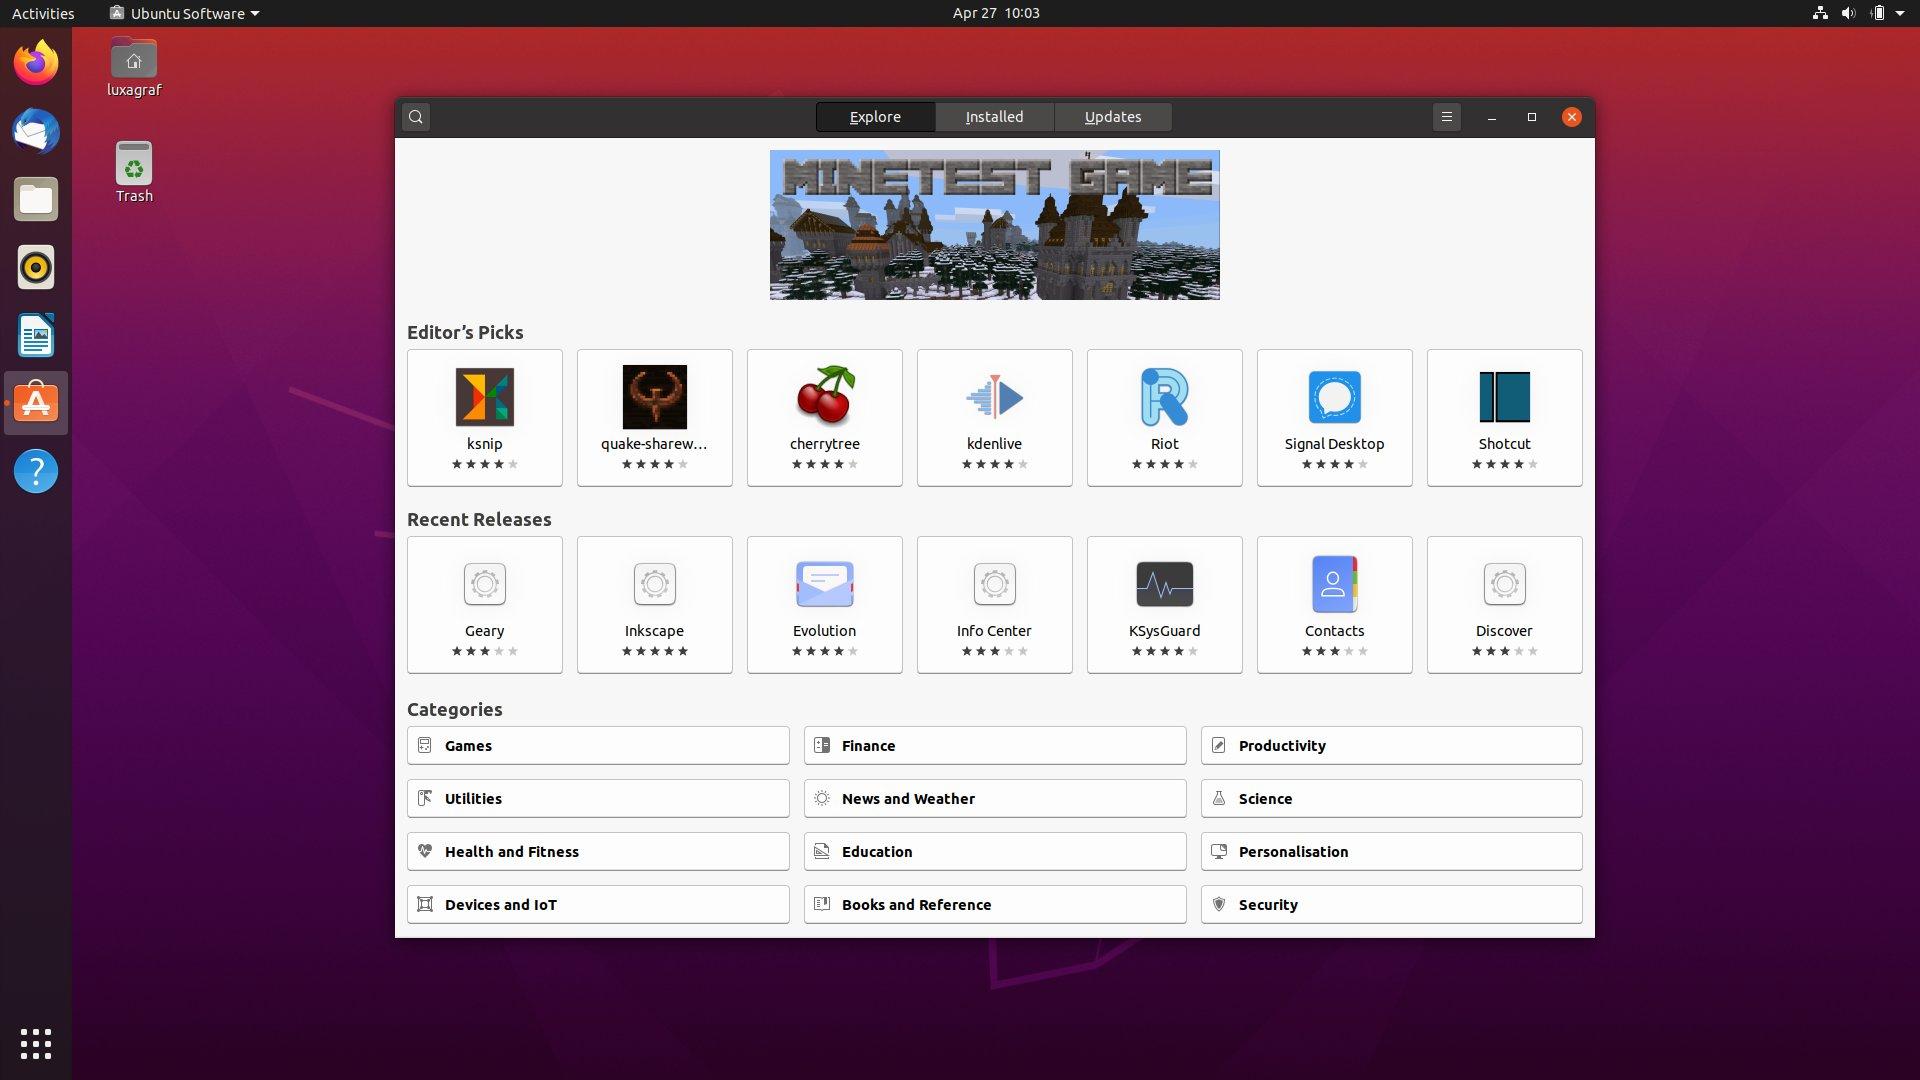 Ubuntu Software received a slight makeover in 20.04.